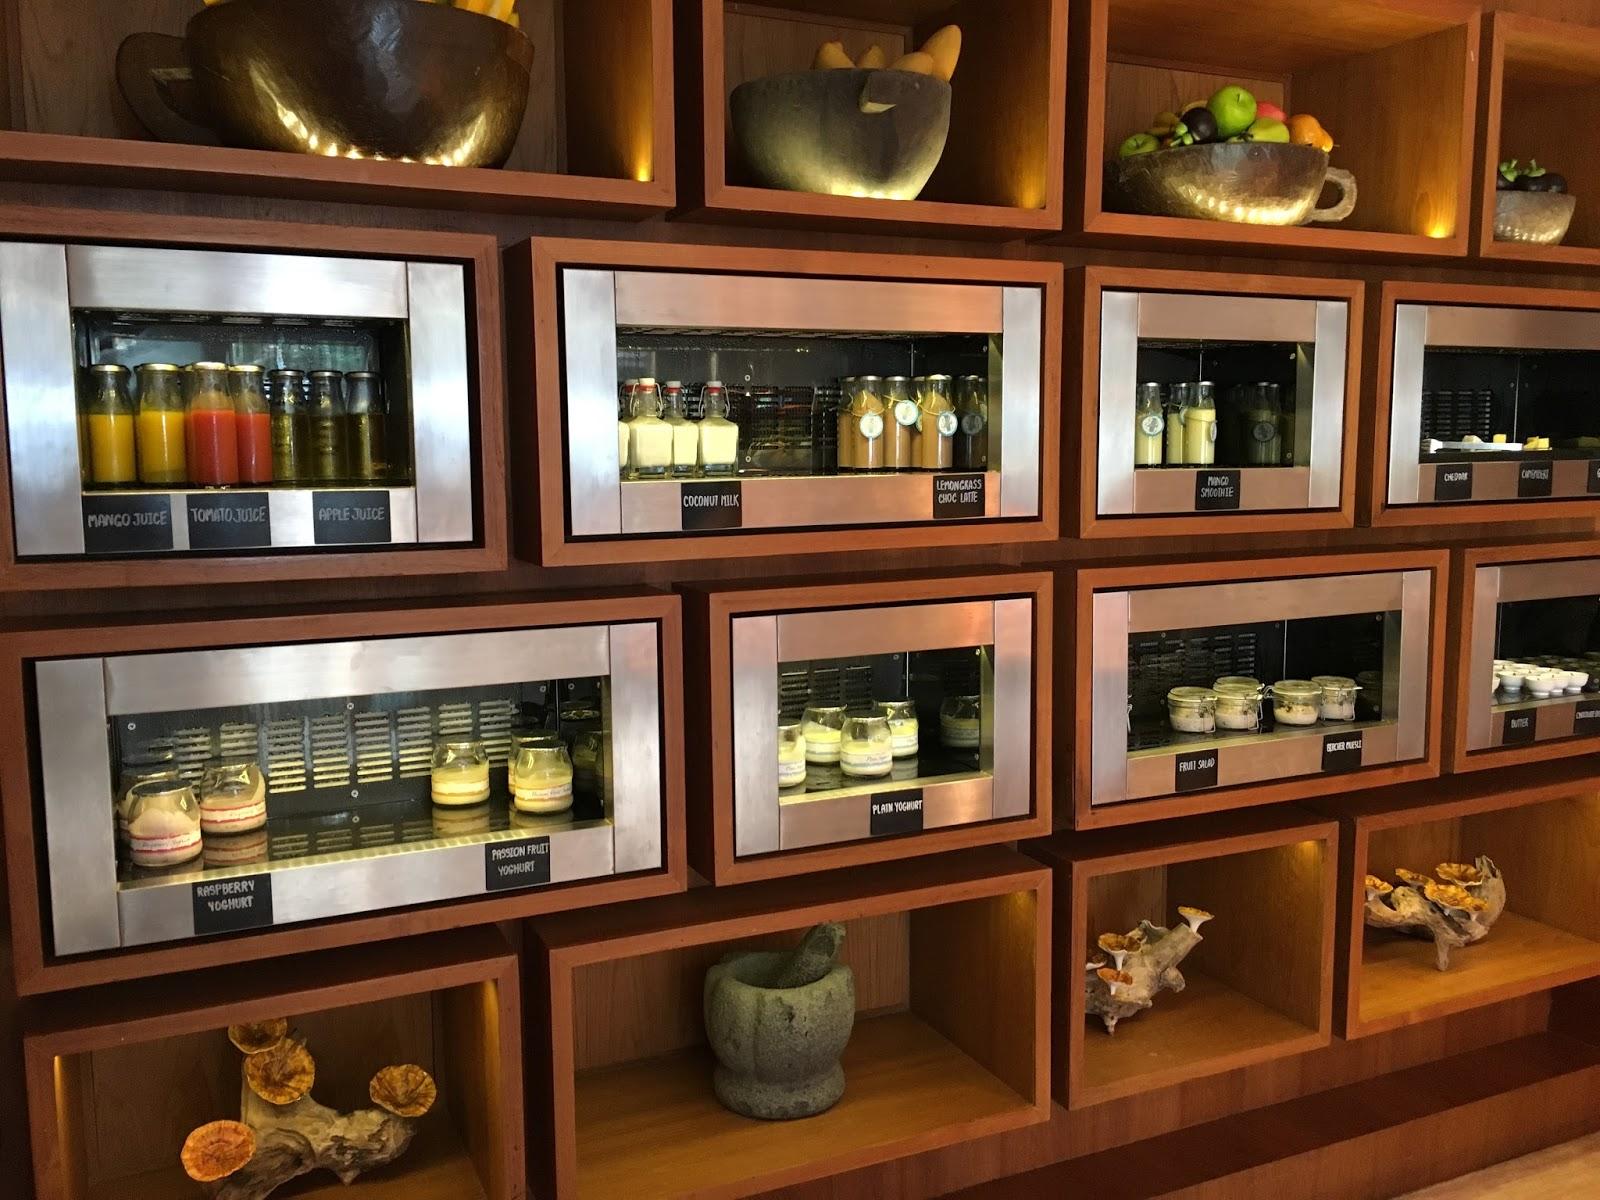 Koh Thai Kitchen And Bar Menu